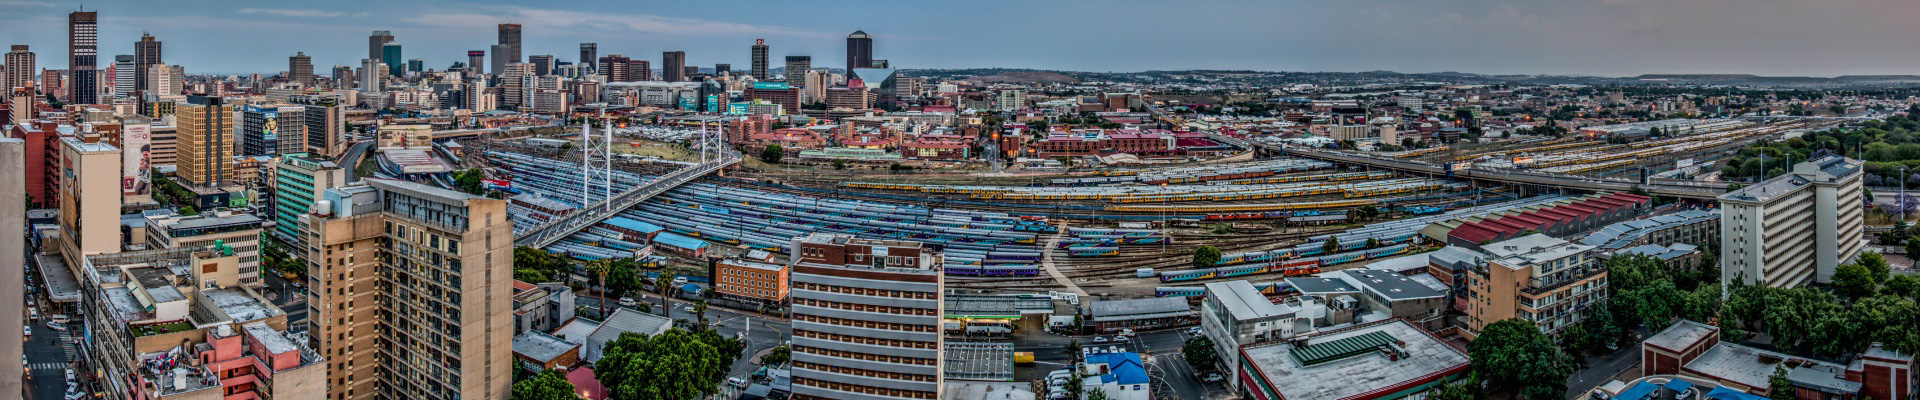 CTH Johannesburg Slider Image